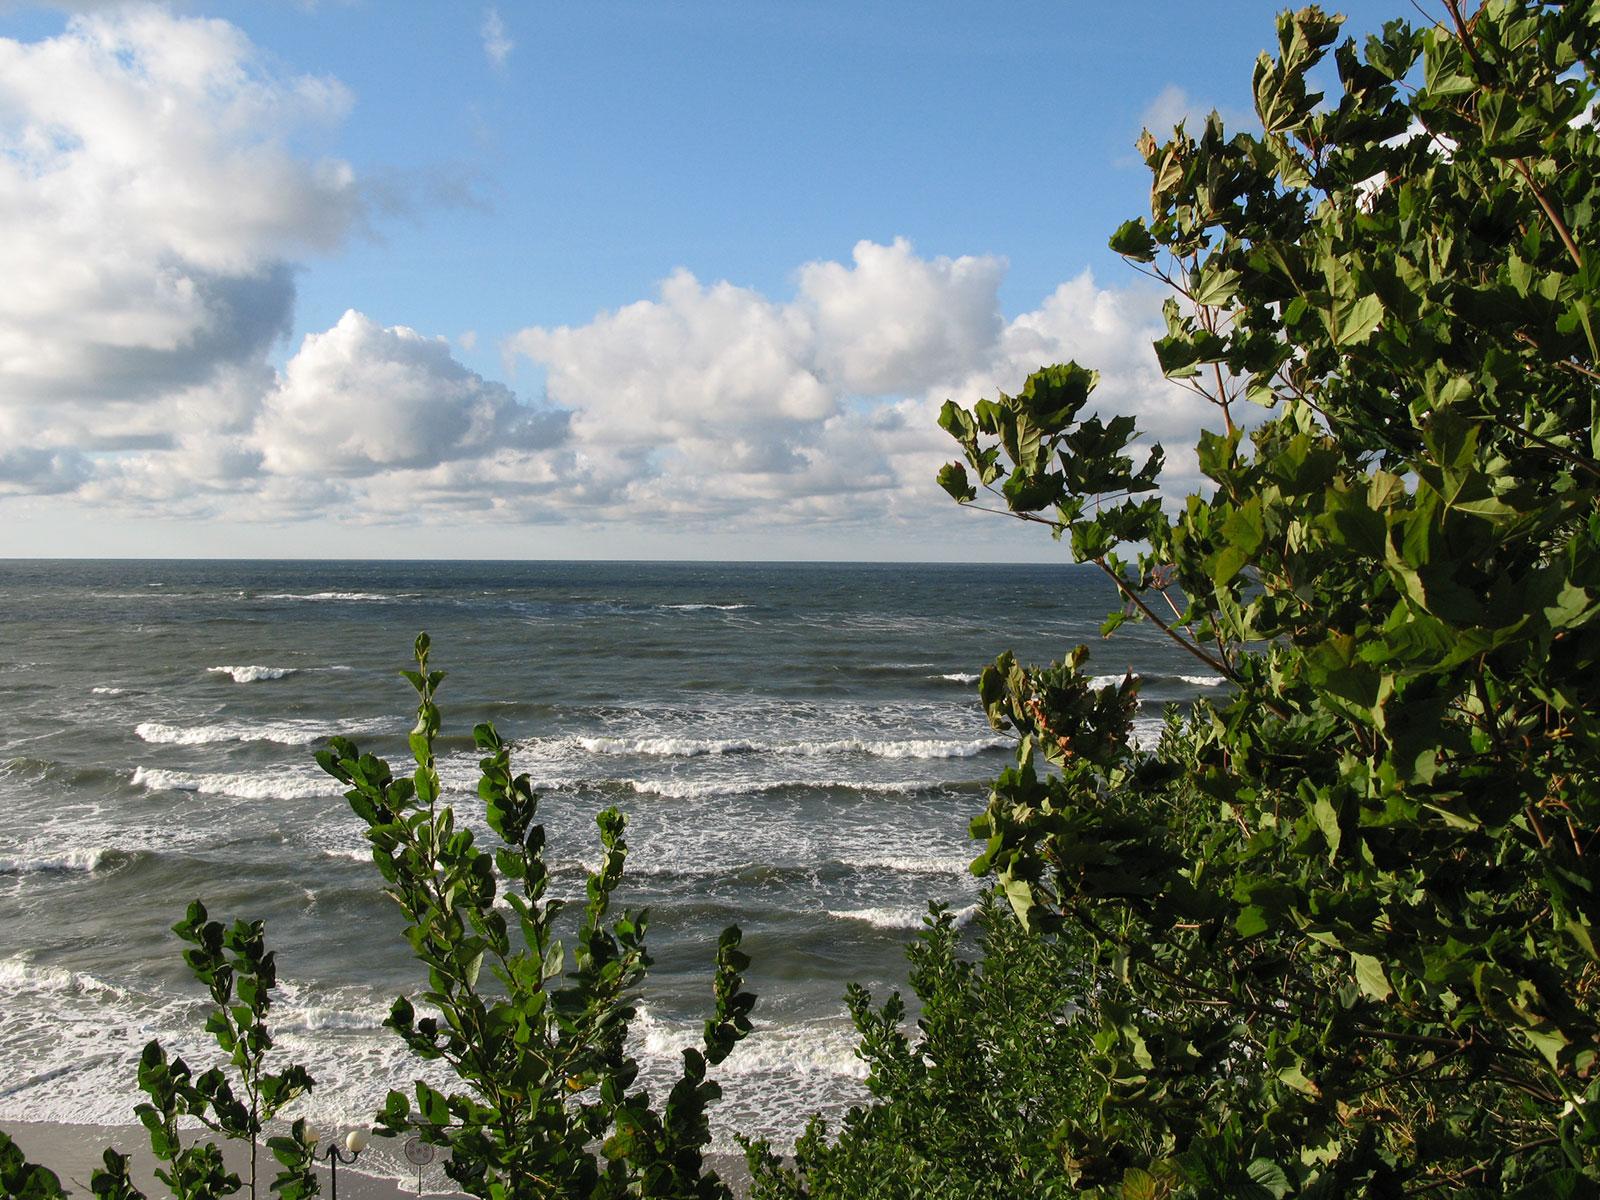 baltiyskoe-more-pionersk-zelen